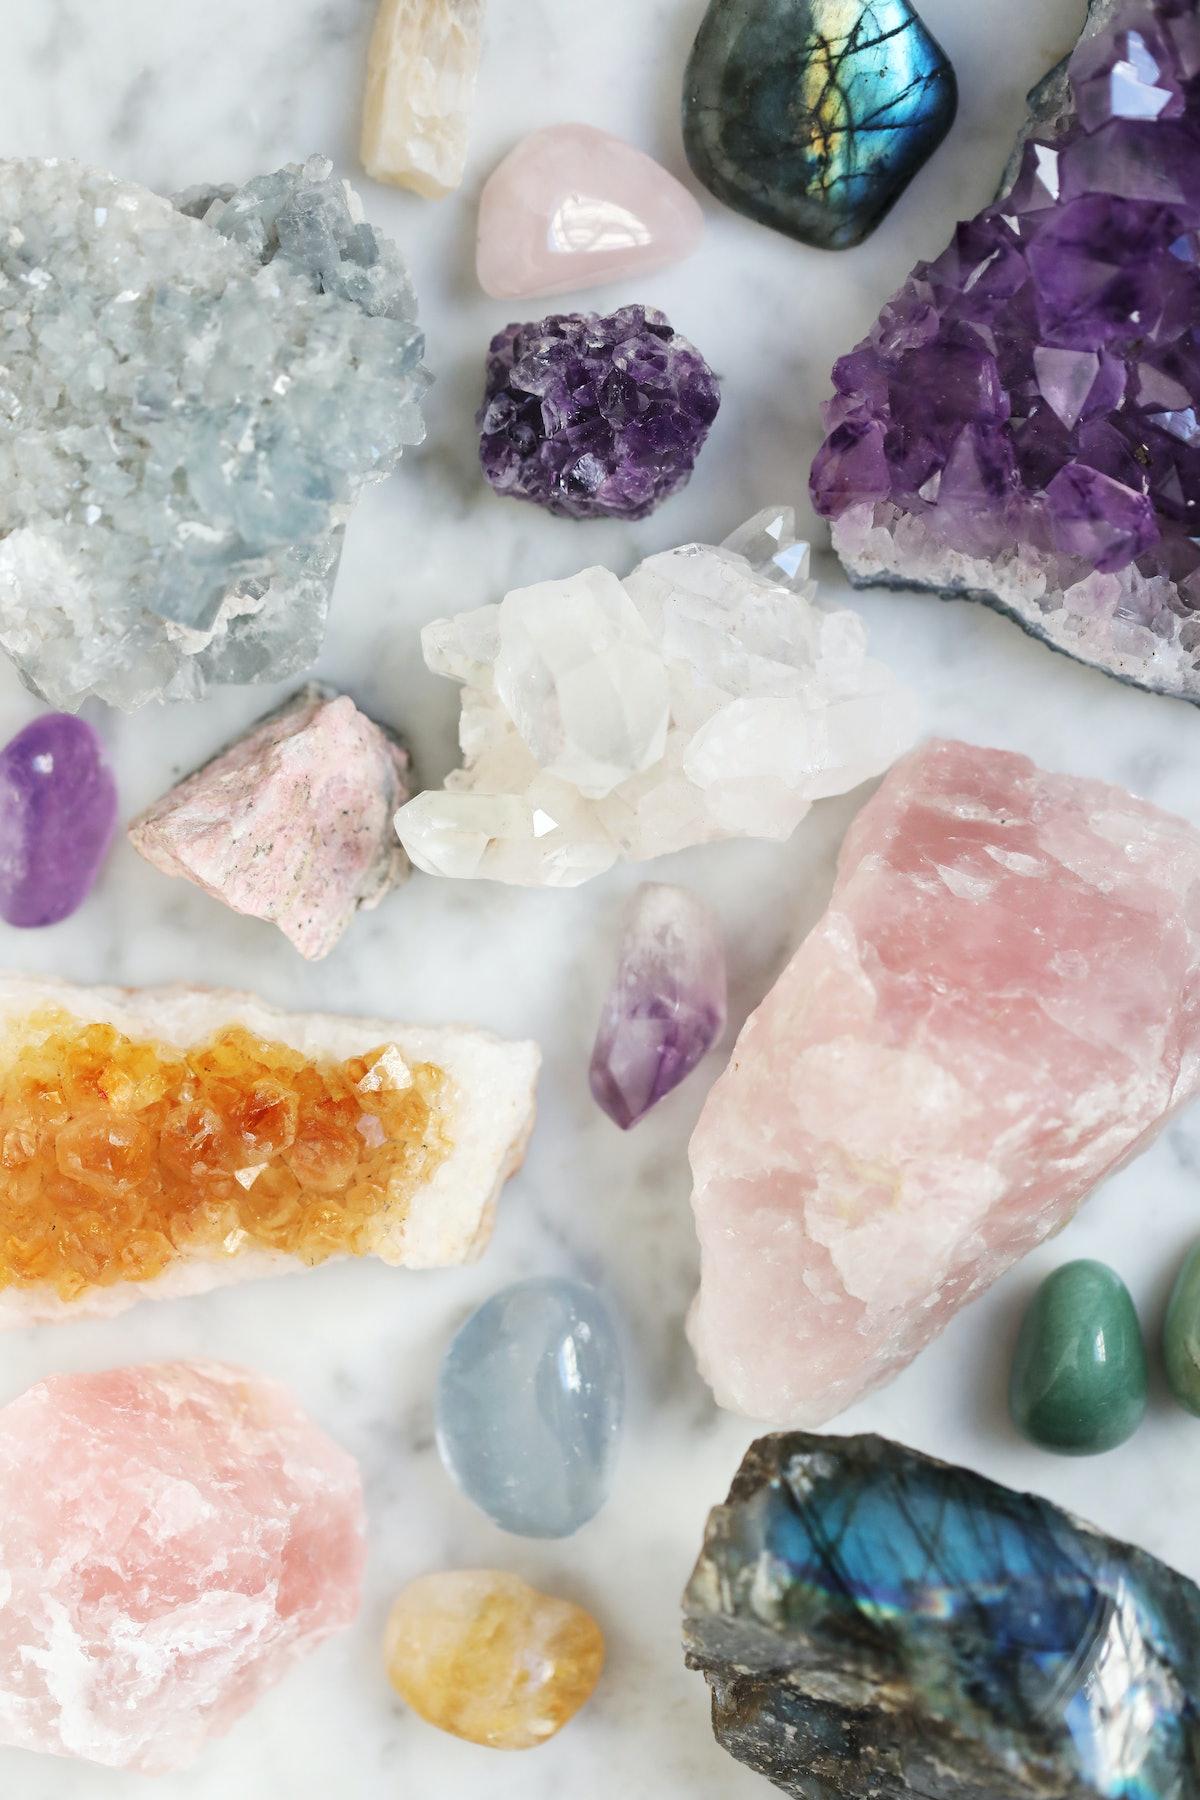 Amethyste, quartz rose, labradorite, citrine, celestine, pierre de lune, aventurine verte, rhodonite...